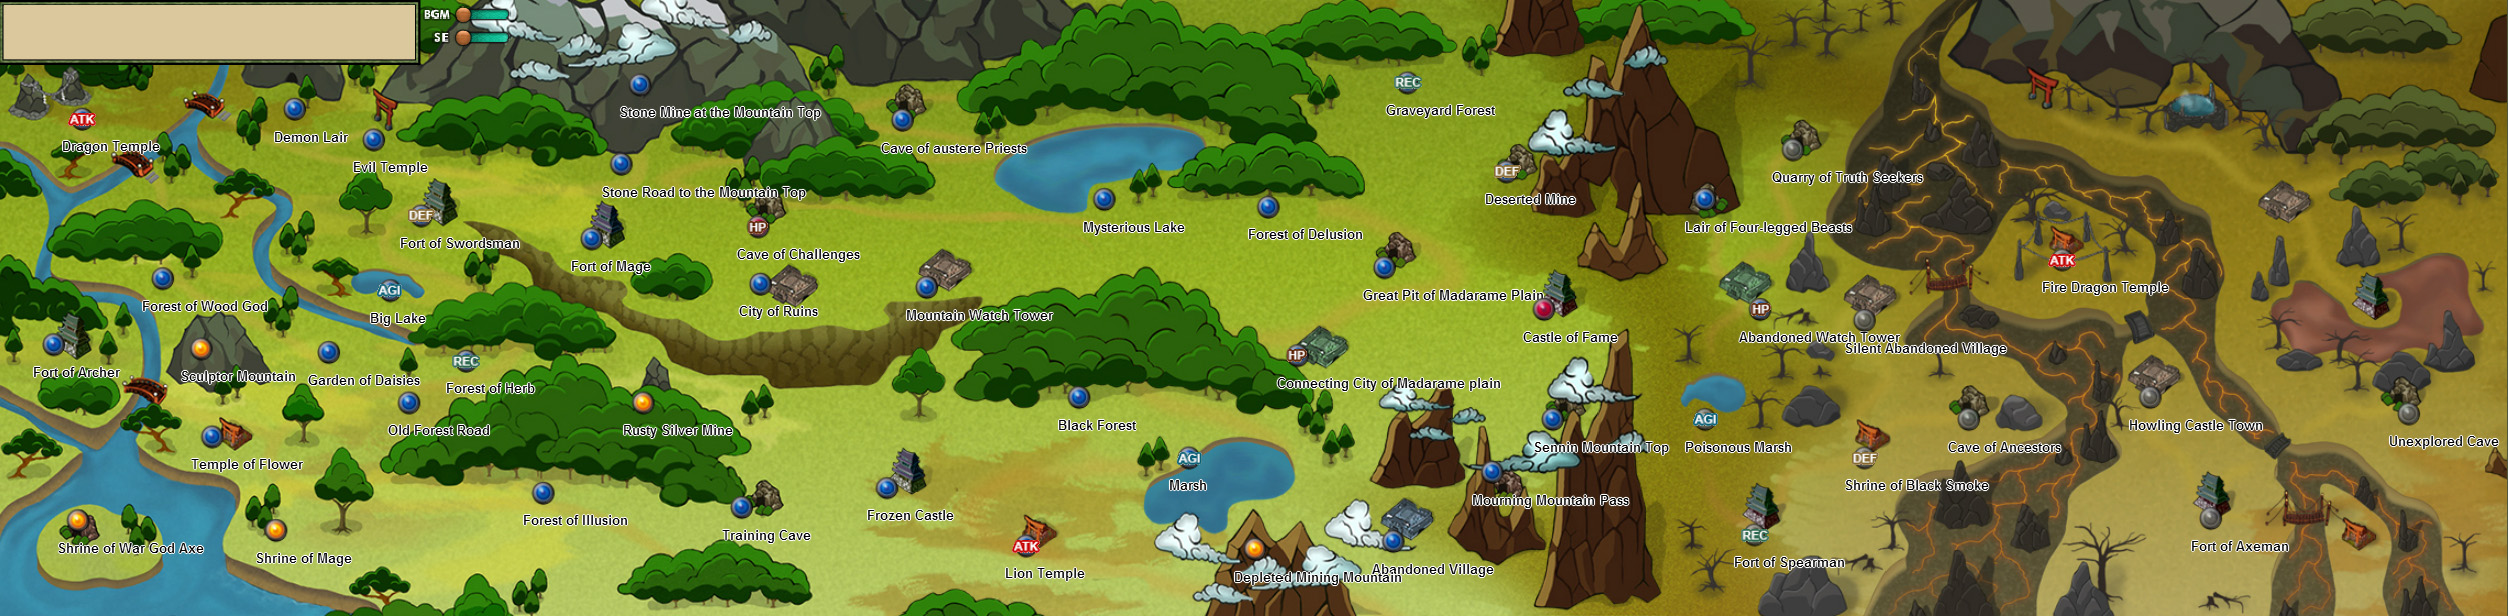 Element fragment map